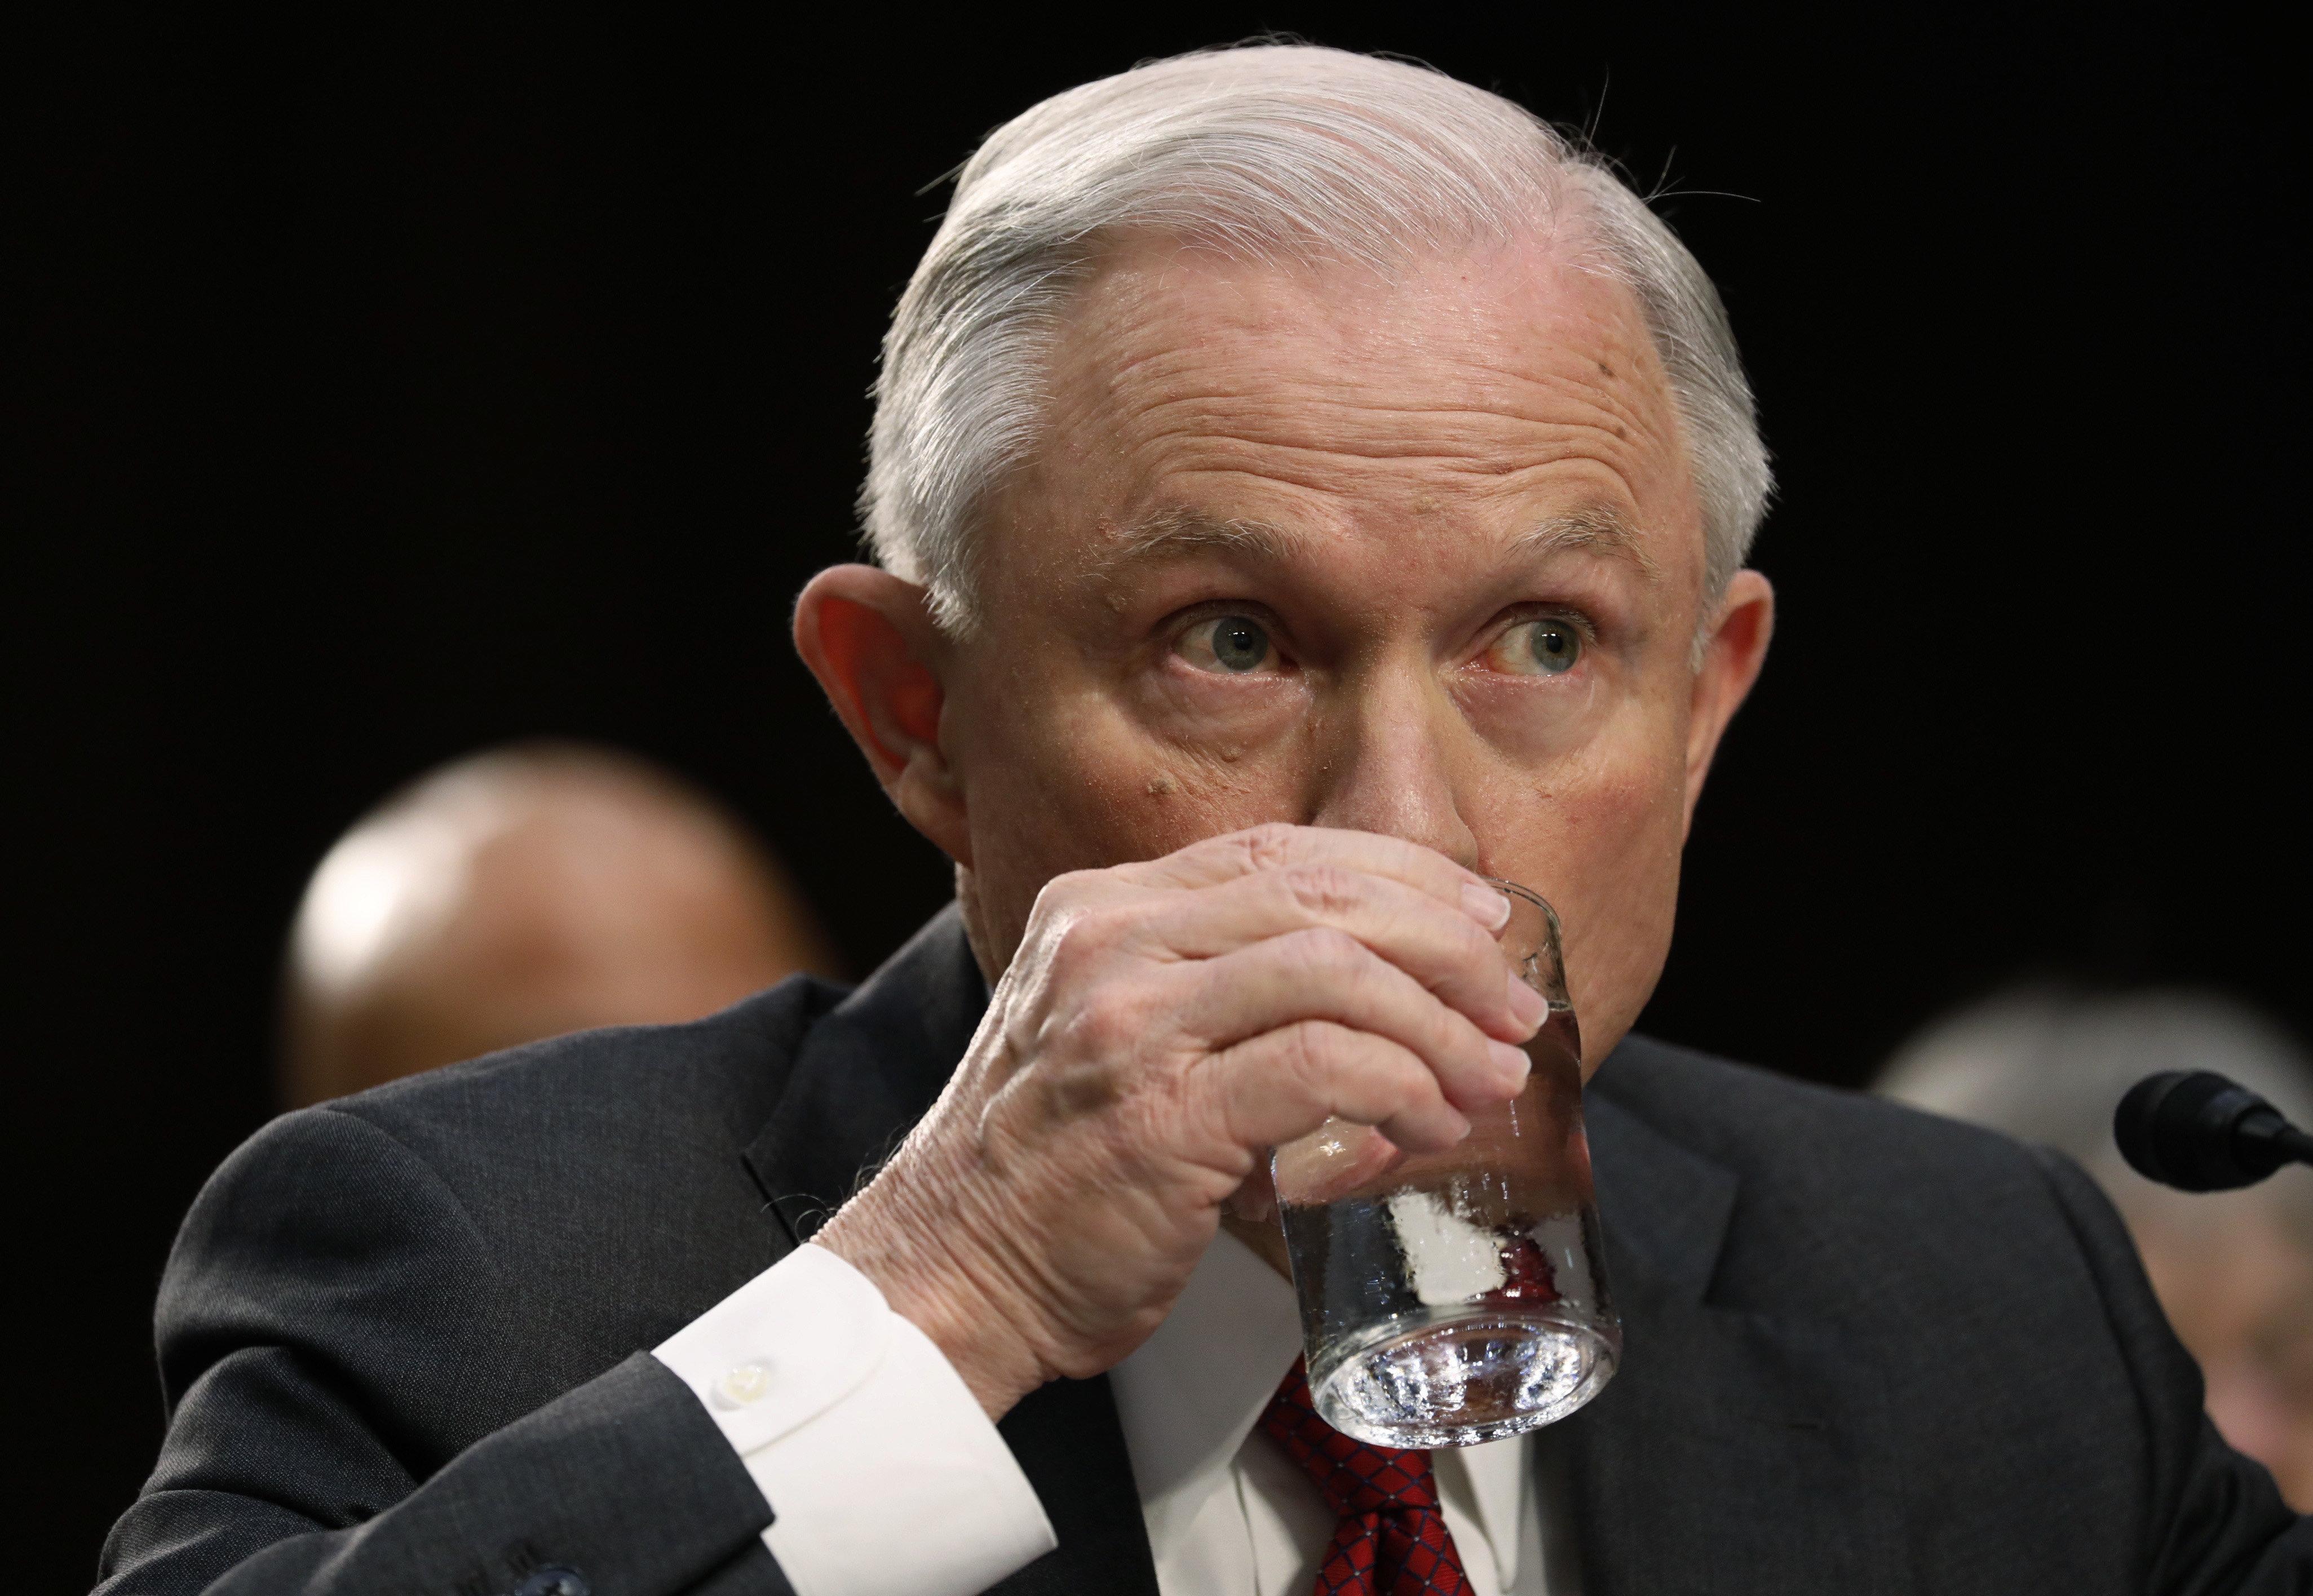 U.S. Attorney General Jeff Sessions testifies before a Senate Intelligence Committee hearing on Capitol Hill in Washington, U.S., June 13, 2017. REUTERS/Aaron P. Bernstein